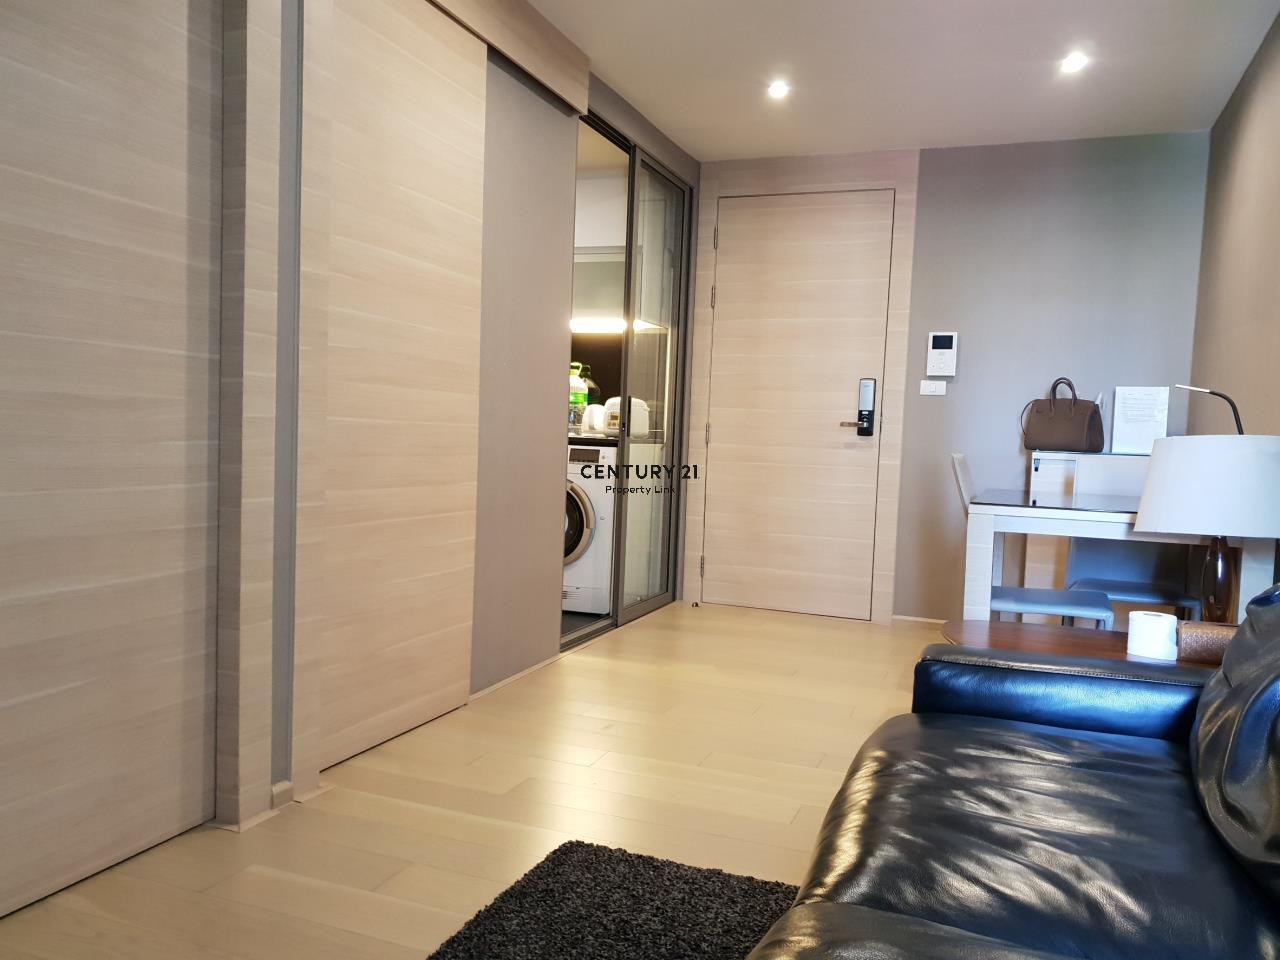 Century21 Property Link Agency's 32-CC-61473 Klass Silom 5